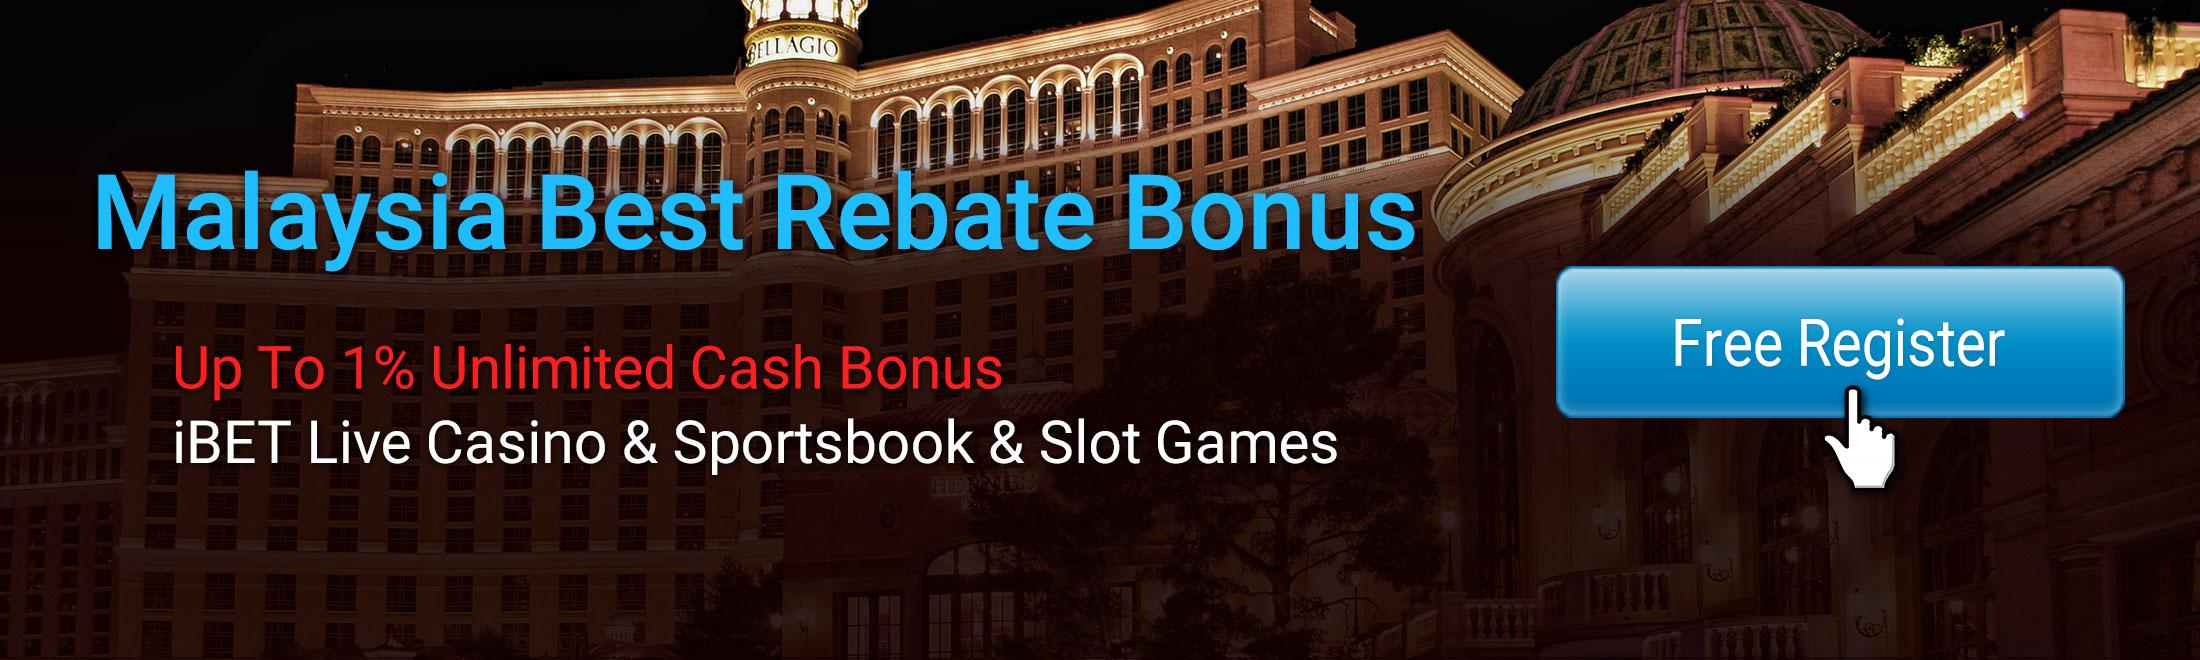 CasinoAdvisorcom  Guide to Best Online Casino Sites